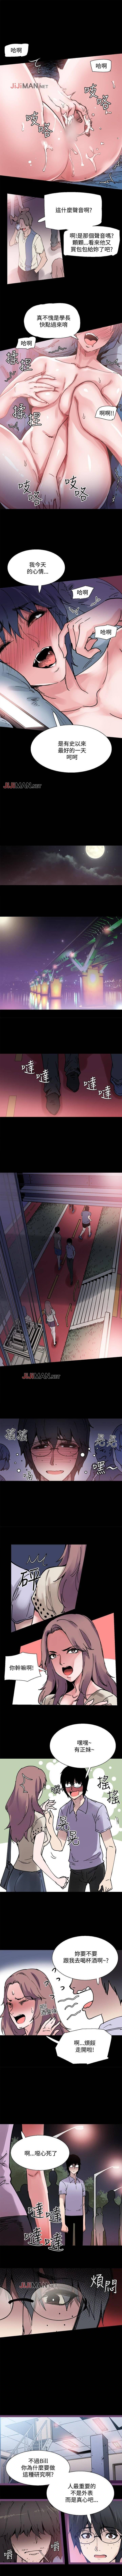 【已完结】Bodychange(作者:Seize & 死亡節奏) 第1~33话 23